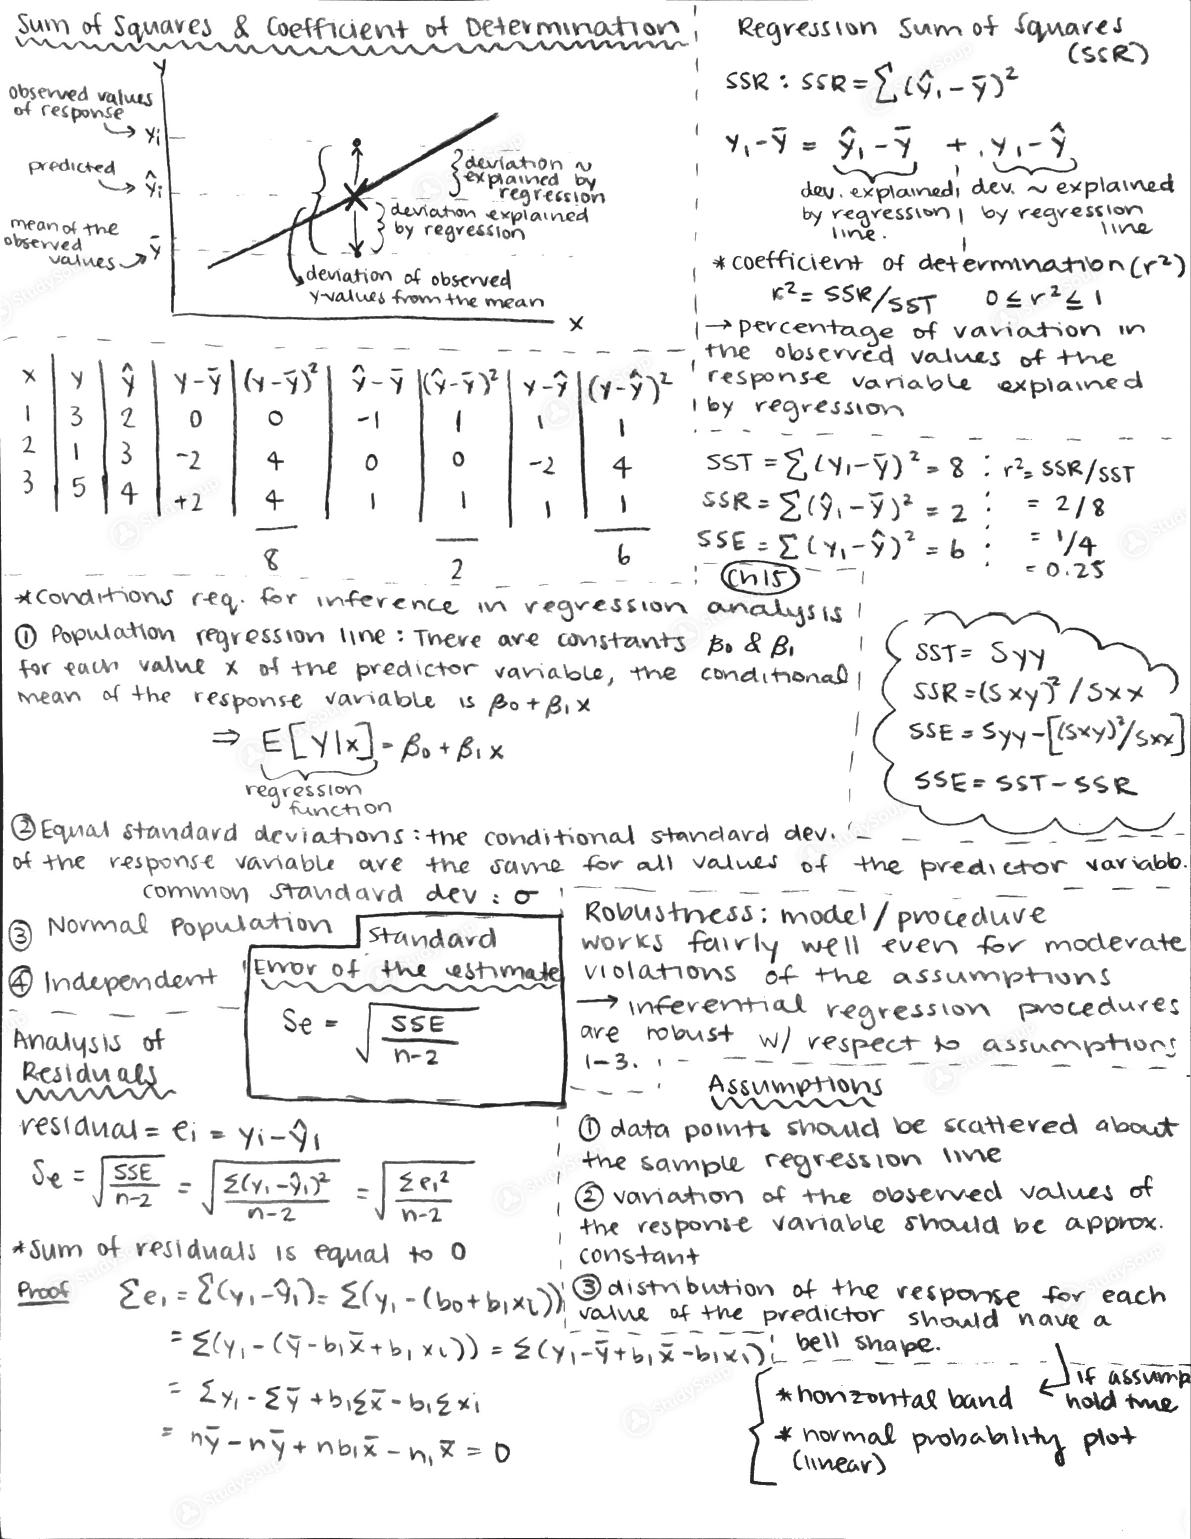 Rutgers - Stats 212 - Study Guide - Final | StudySoup